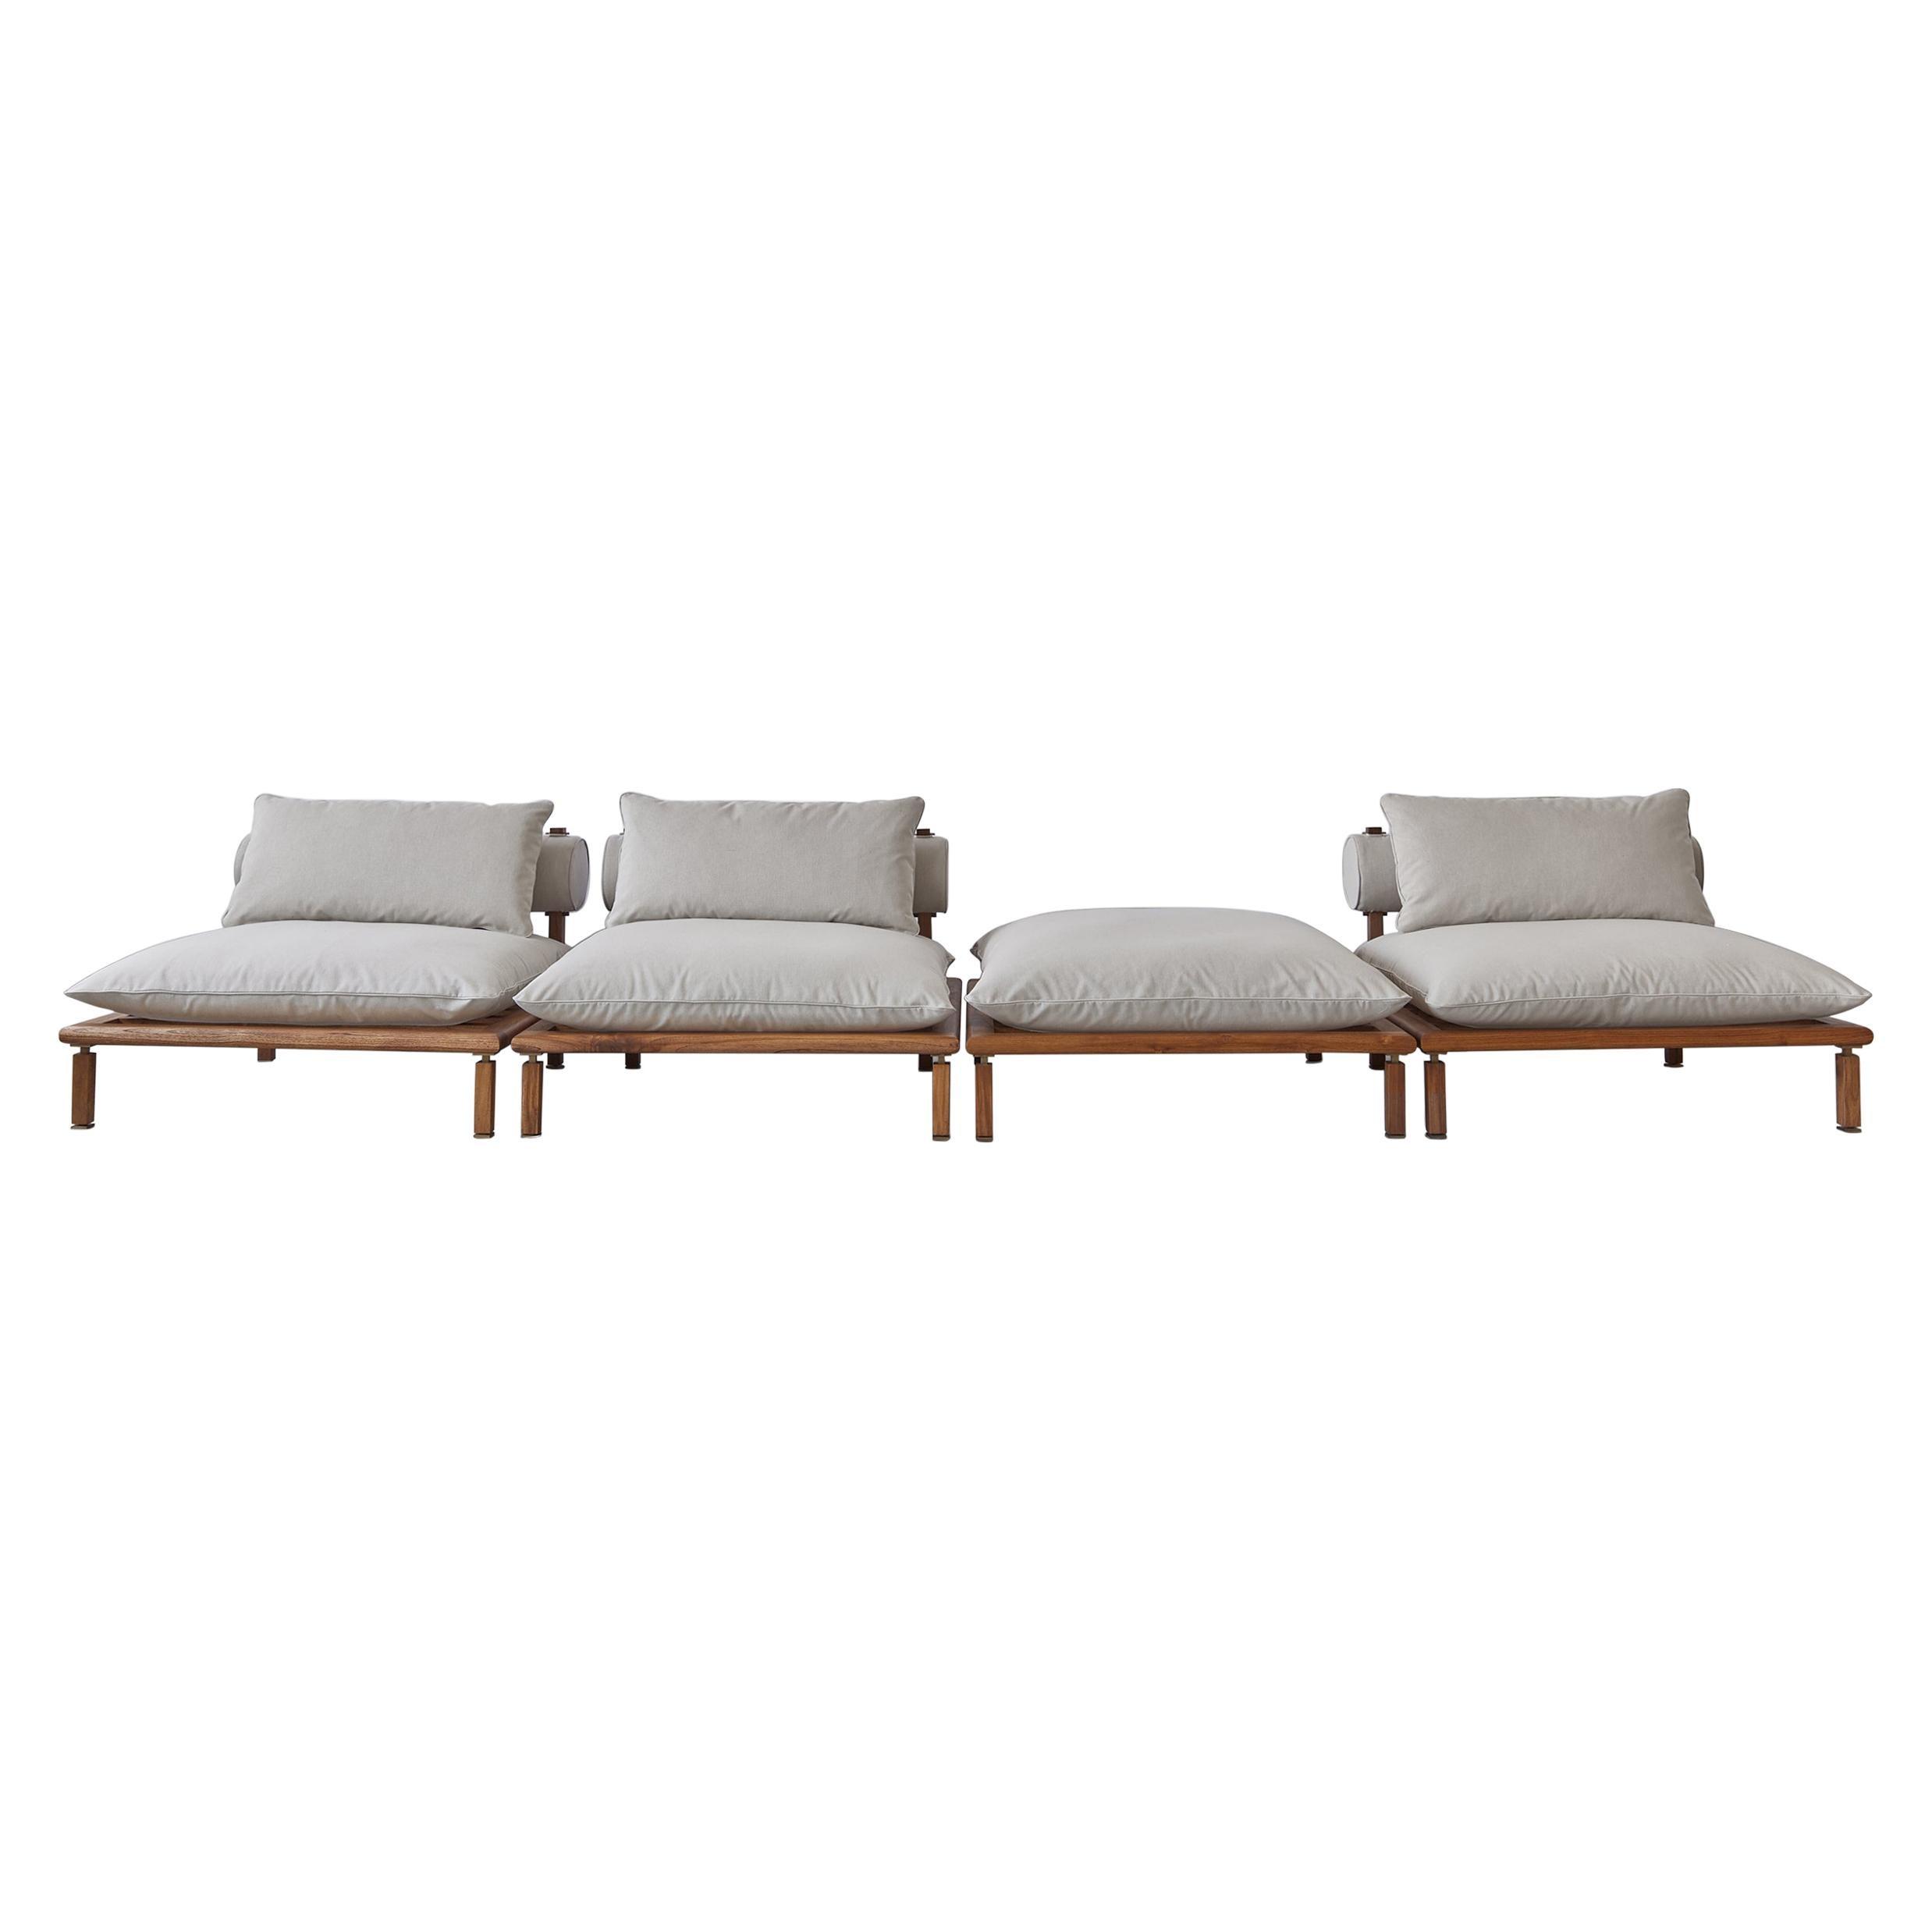 Nerthus Indoor Outdoor Sofa in Mahogany by ATRA